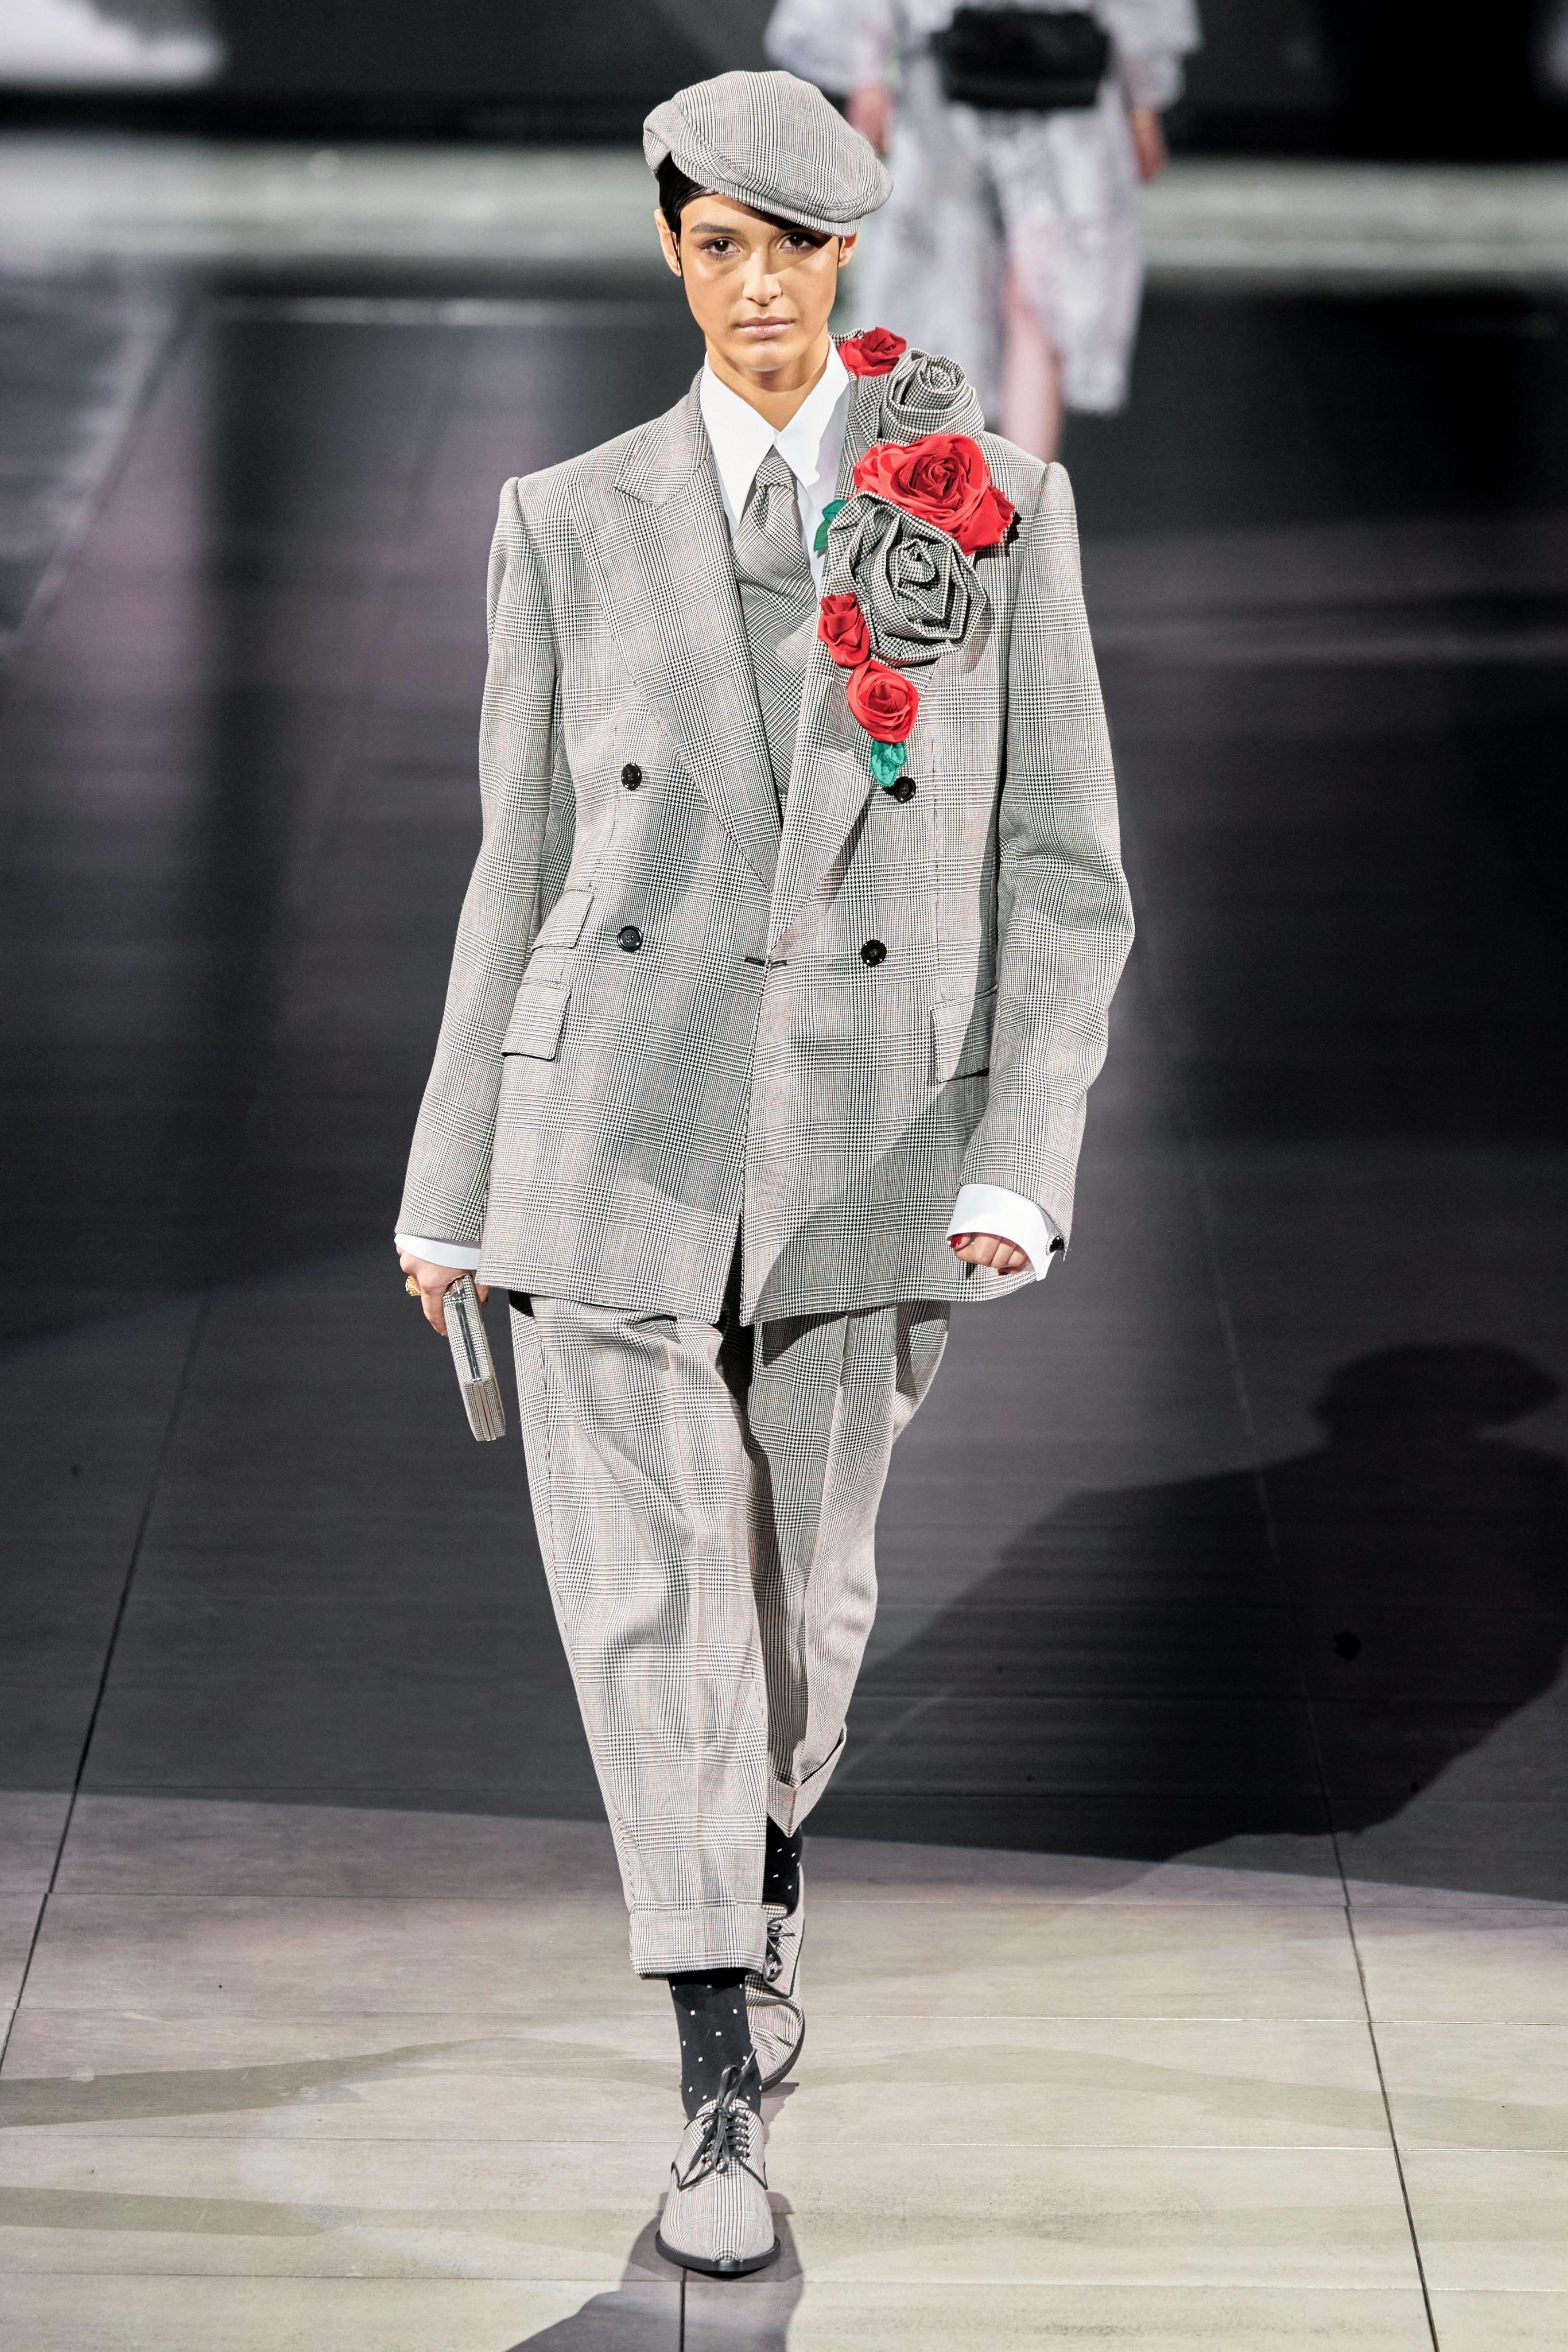 Khong co khach moi den Milan Fashion Week vi lo ngai virus corona hinh anh 41 ALE0800.jpg